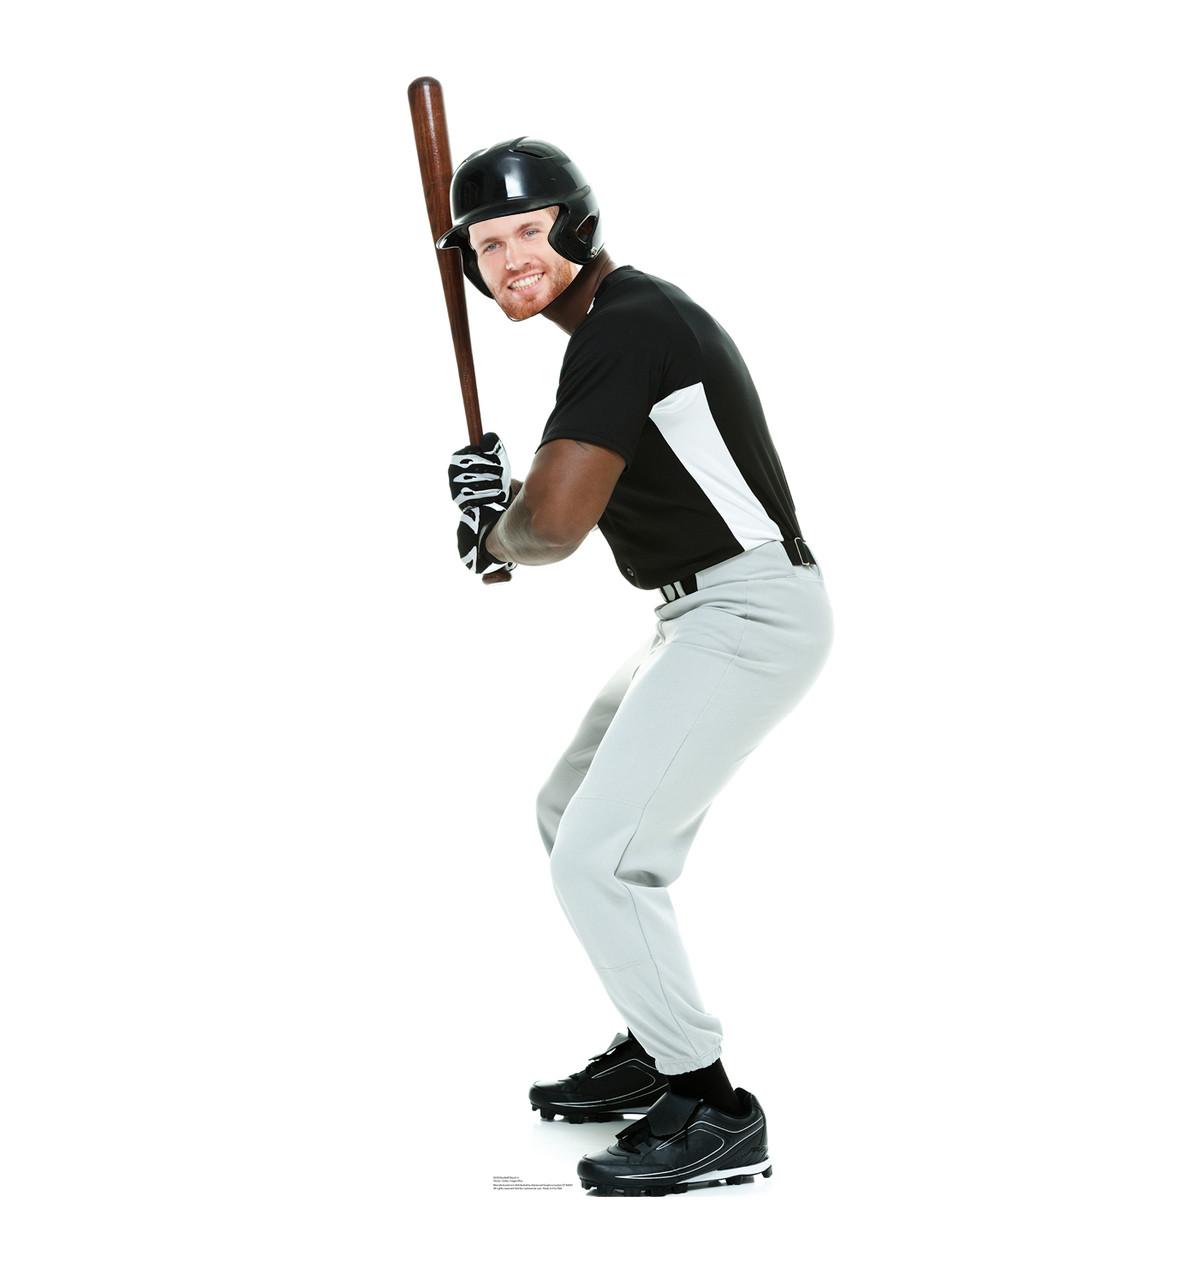 Life-size Baseball player Stand-In Cardboard Standup | Cardboard Cutout 3